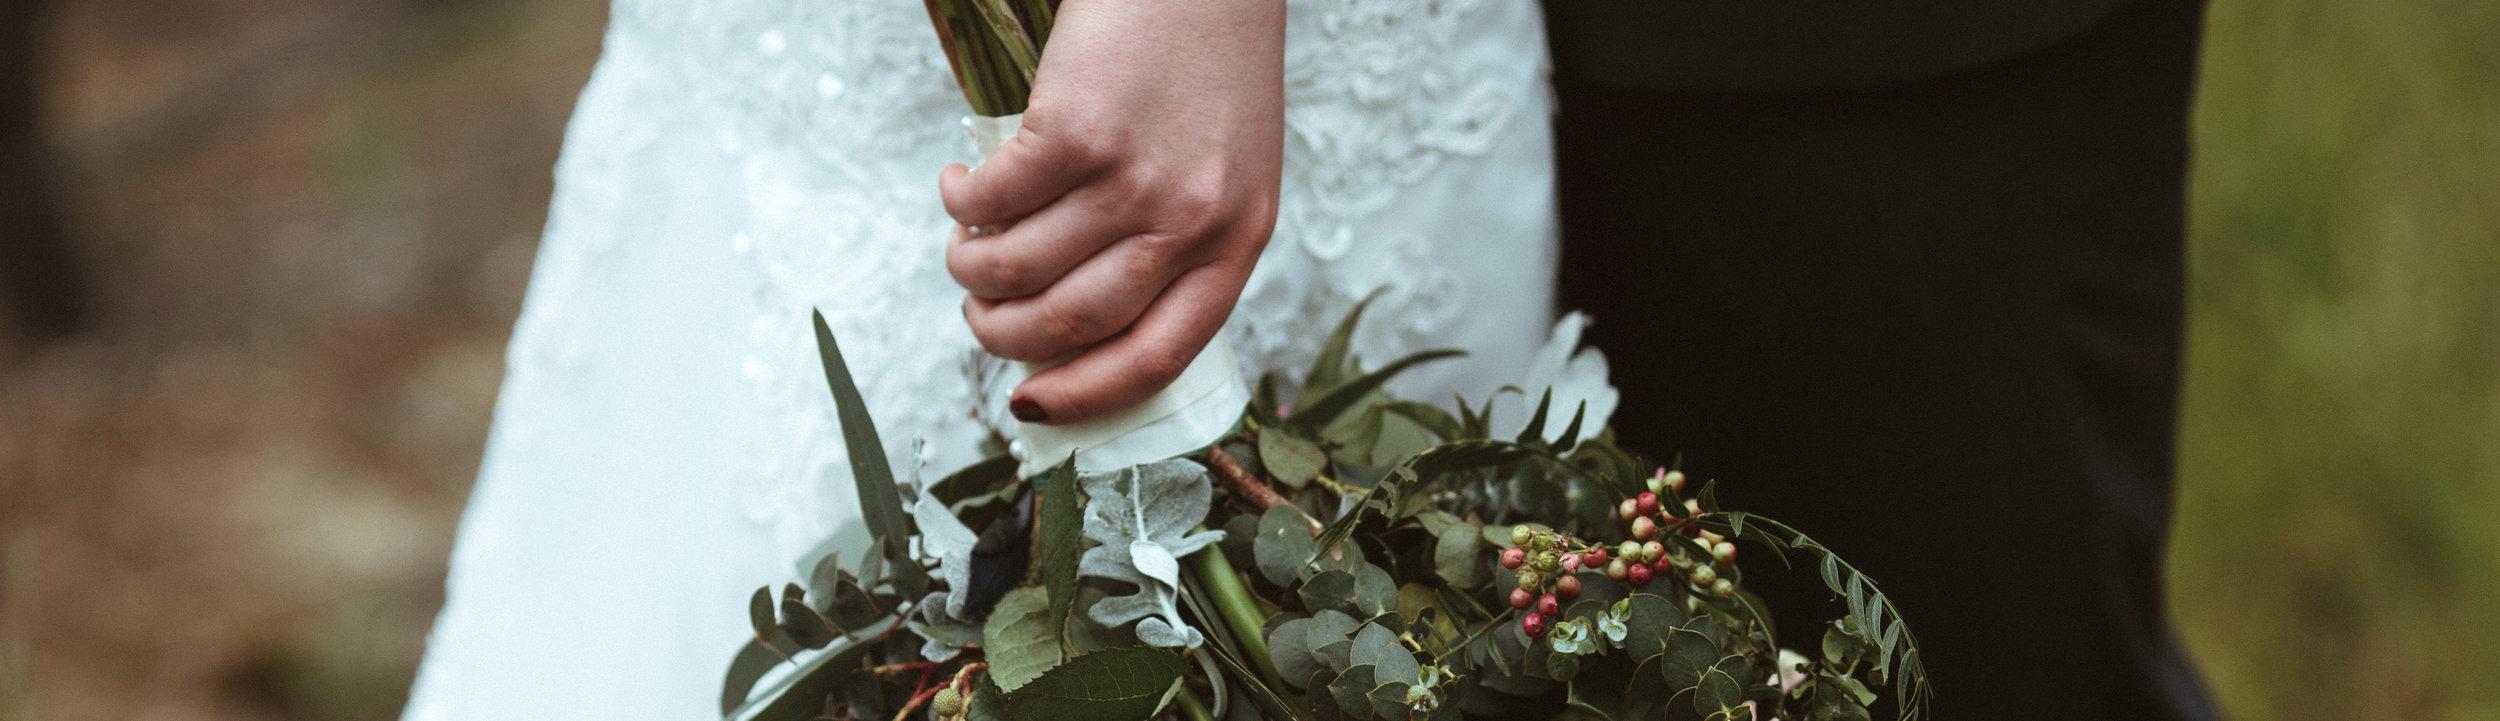 WEDDINGS + ENGAGEMENTS -